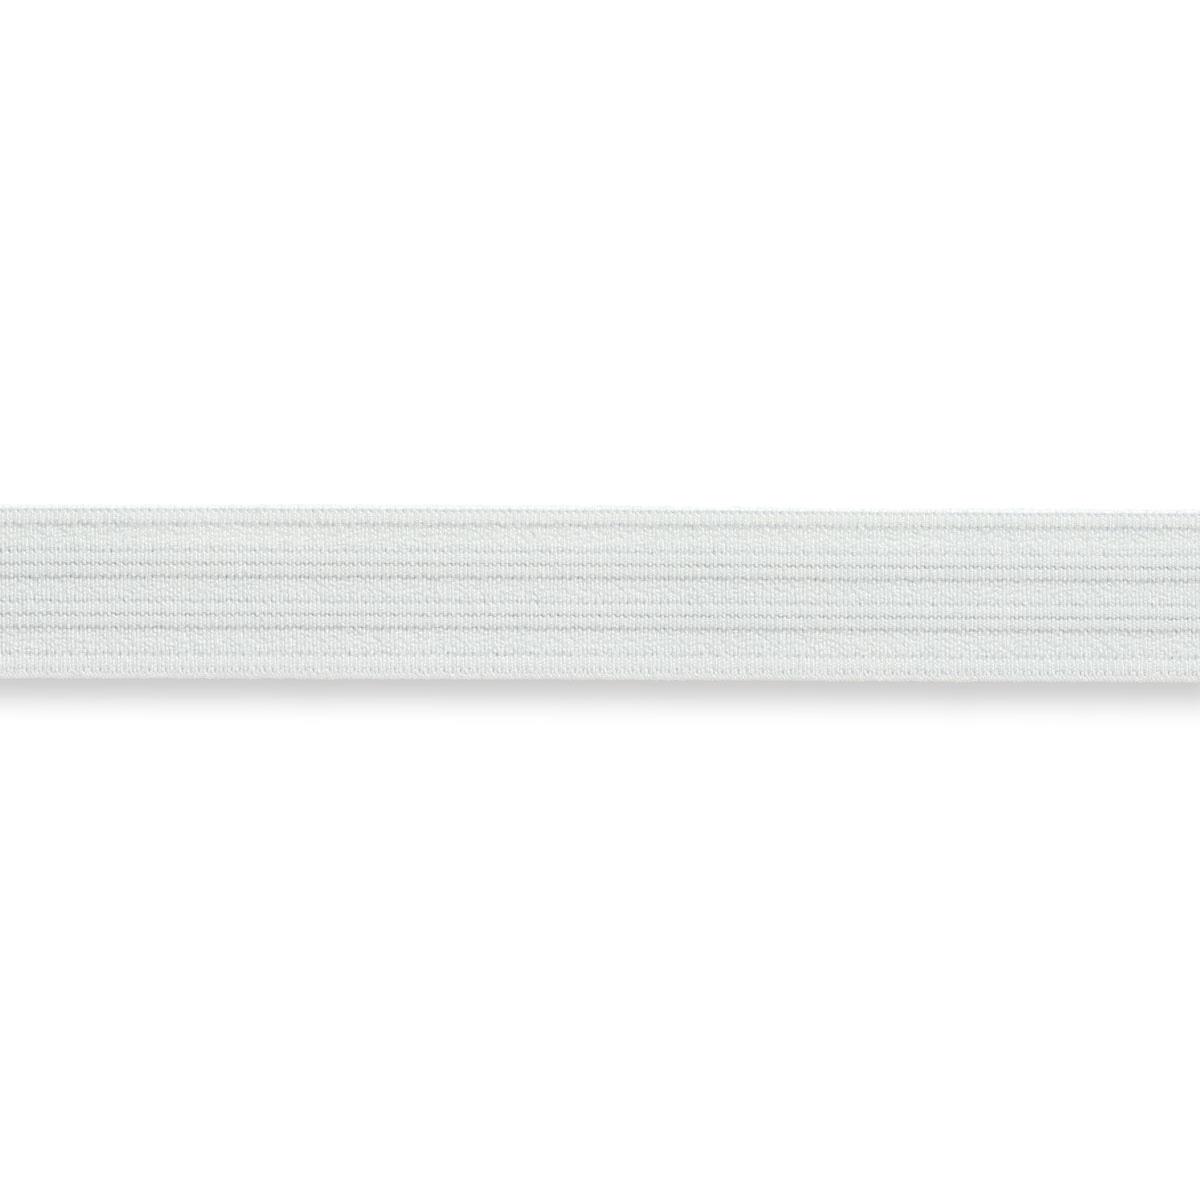 955478 Эластичная лента для уплотнения шва 25 мм 10м белый натуральный цв. Prym